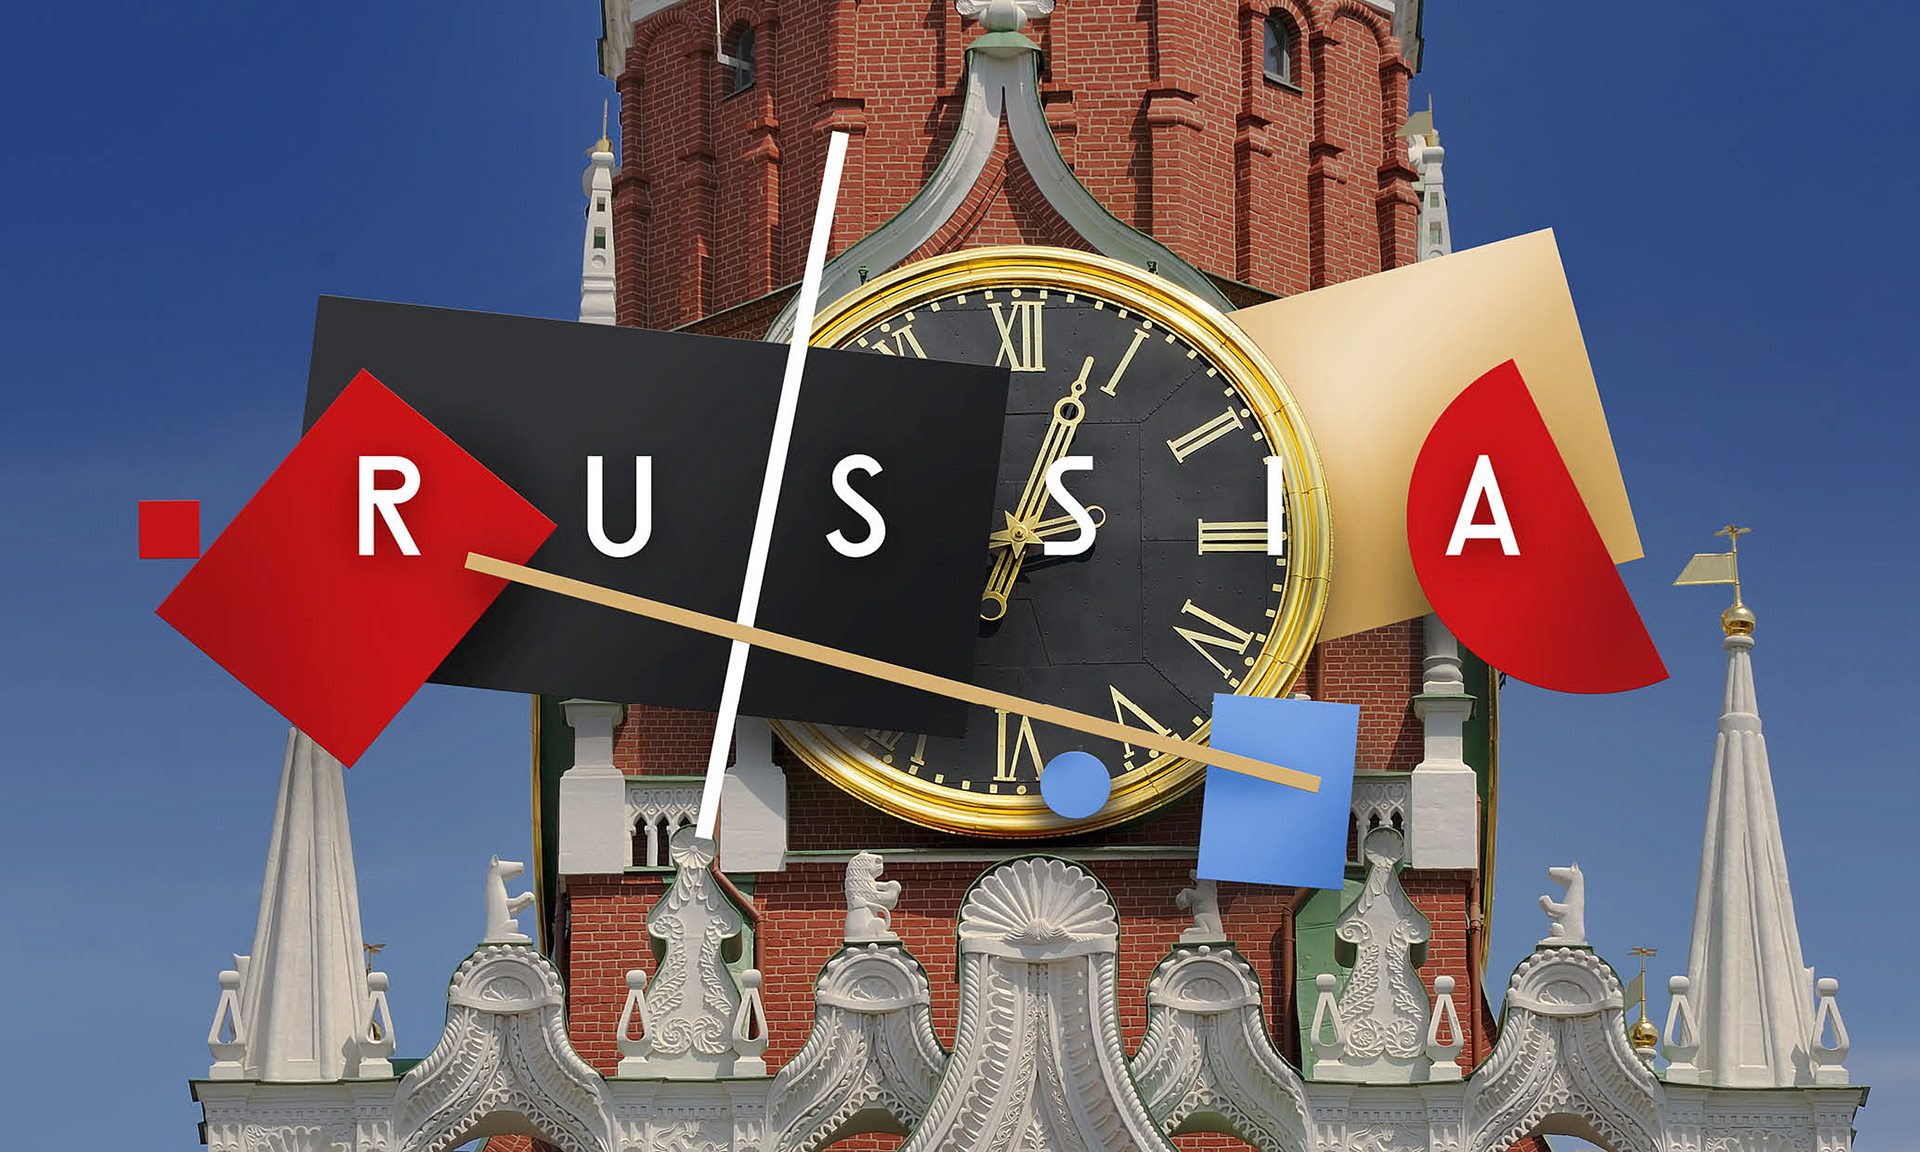 https://www.behance.net/gallery/64720835/Russia-tourism-brand